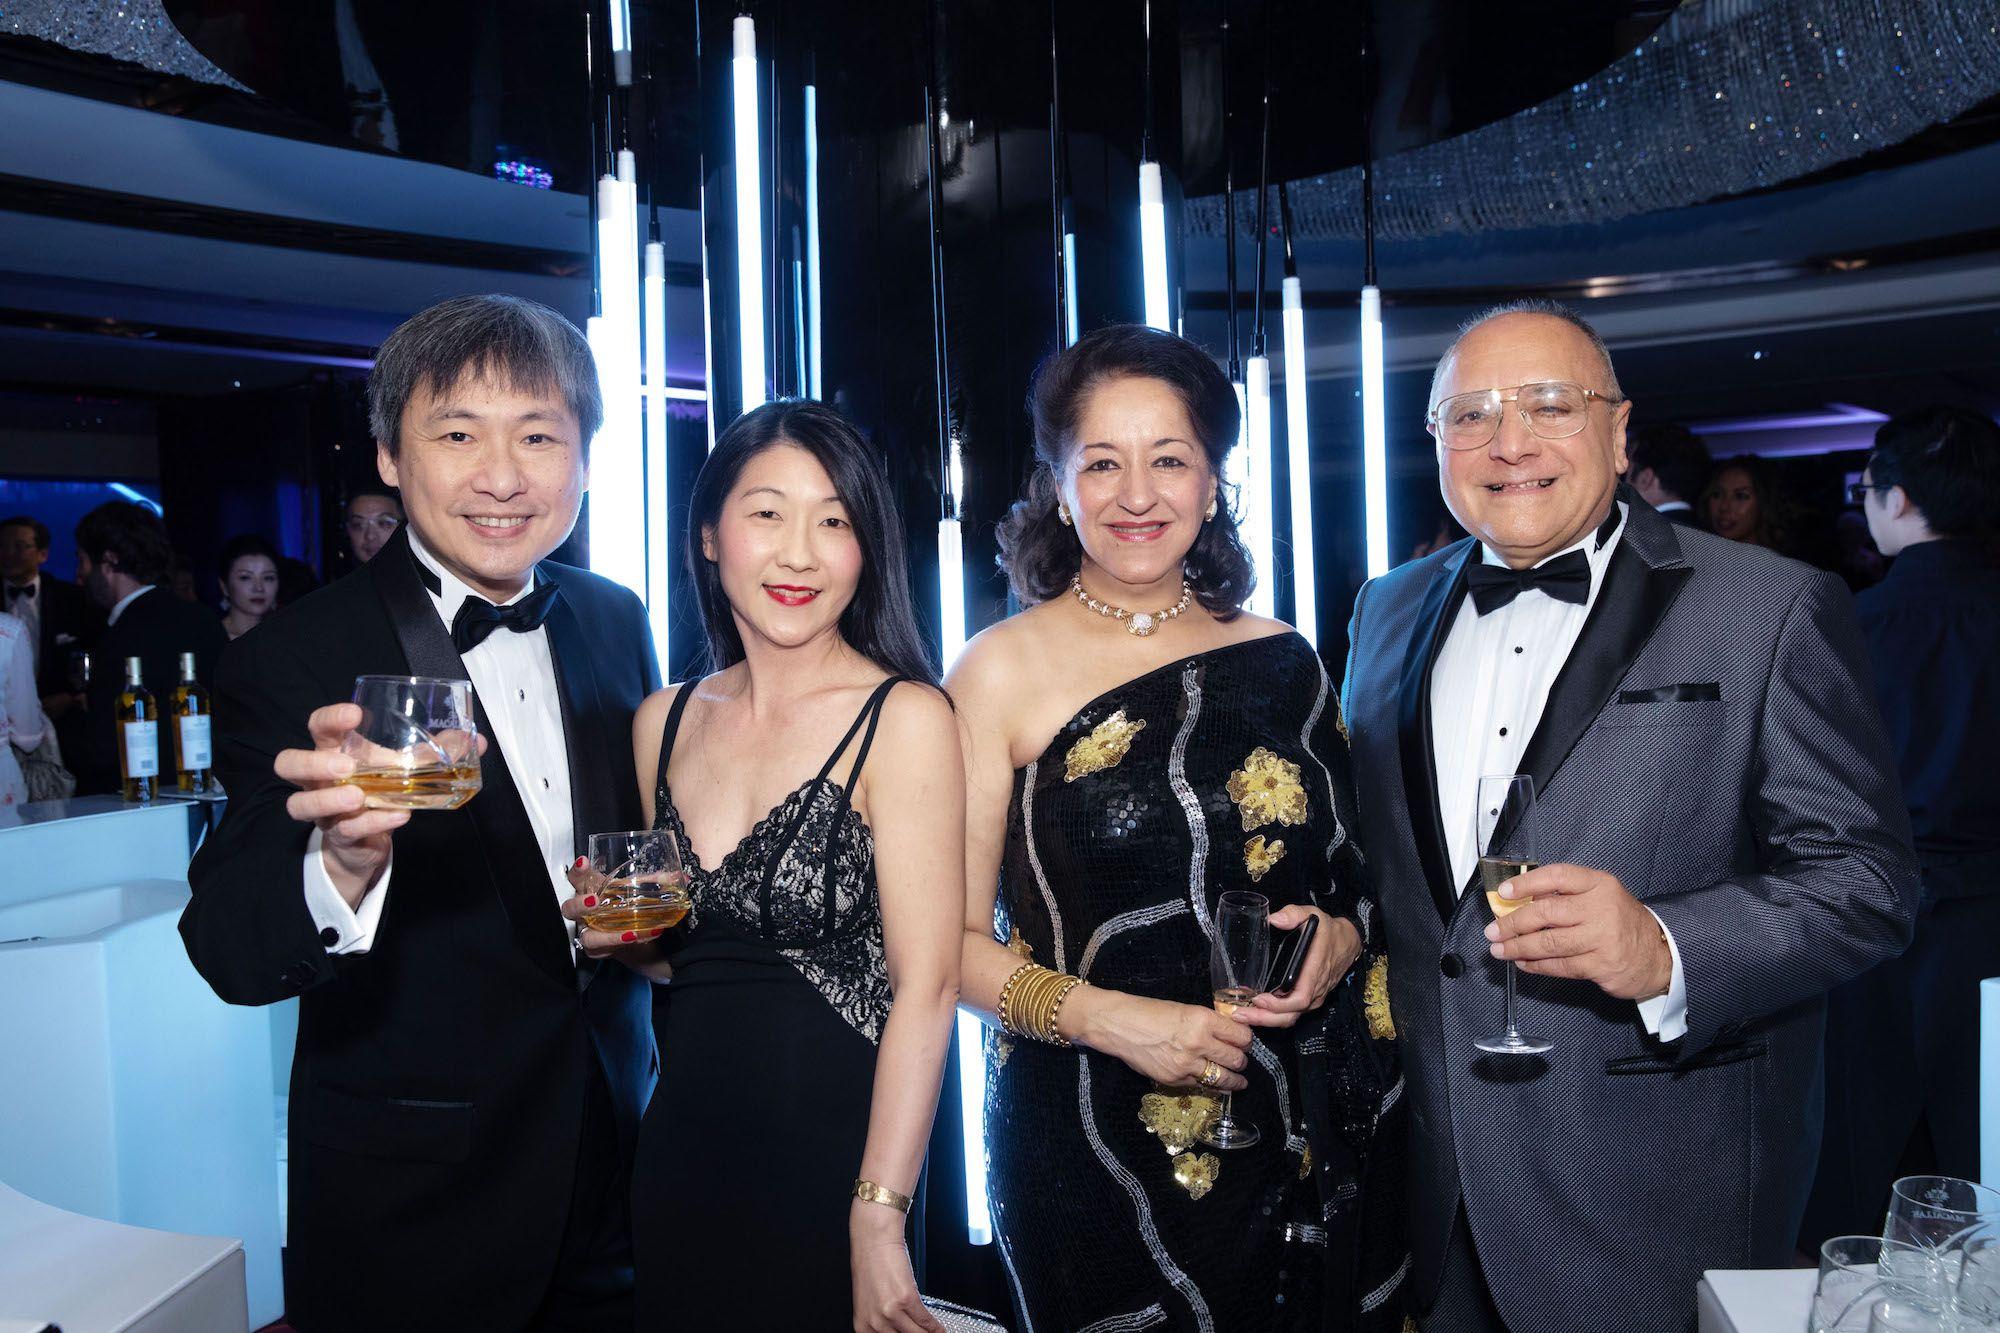 Peter Woo, May Wong, Chitra Chellaram, Manolo Chellaram